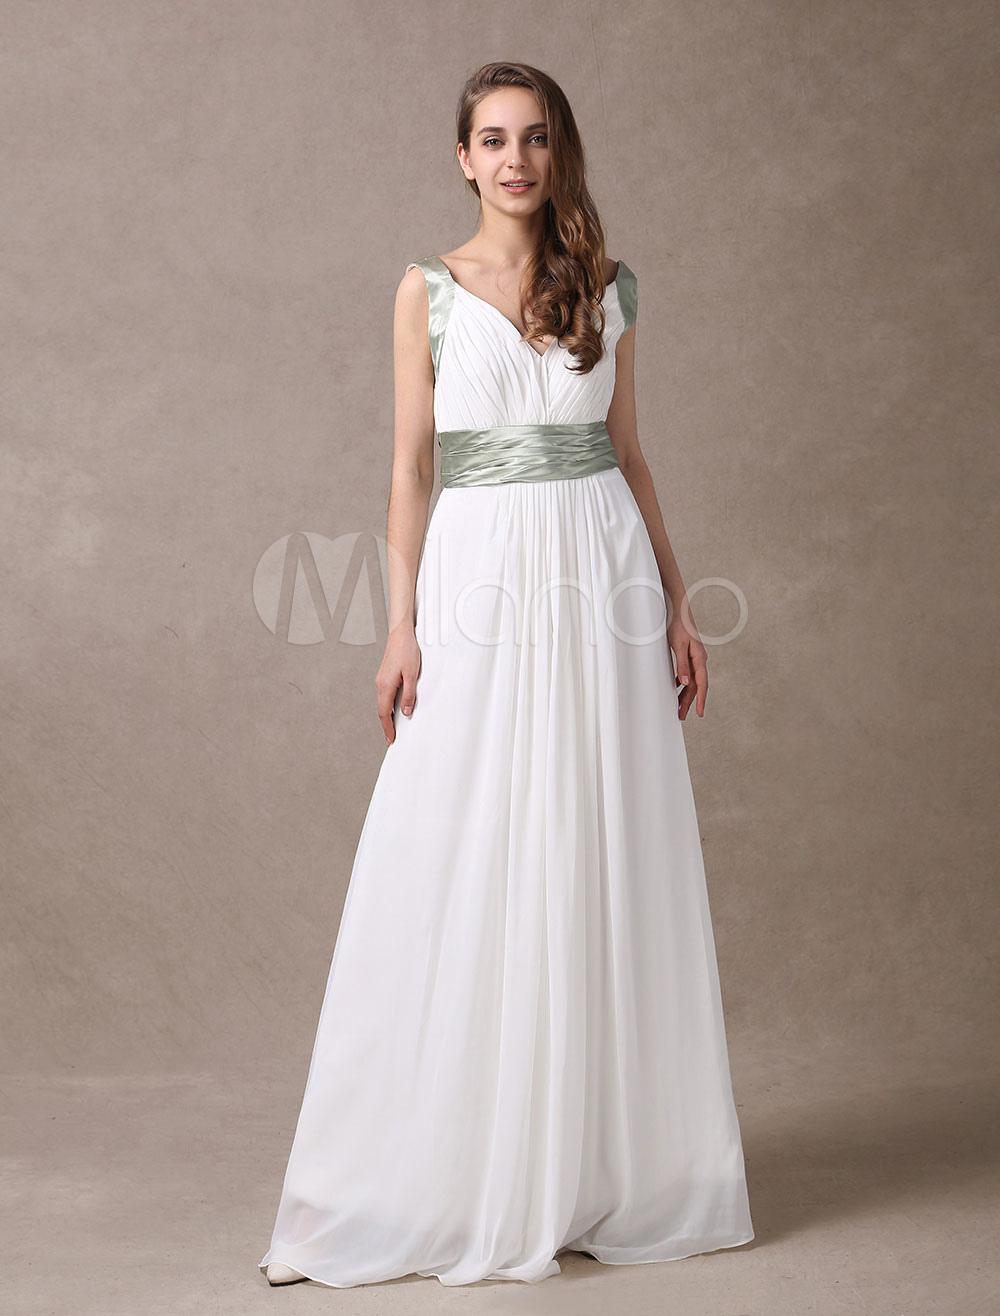 Attractive Ivory Chiffon Deep V-neck Maternity Bridesmaid Dress